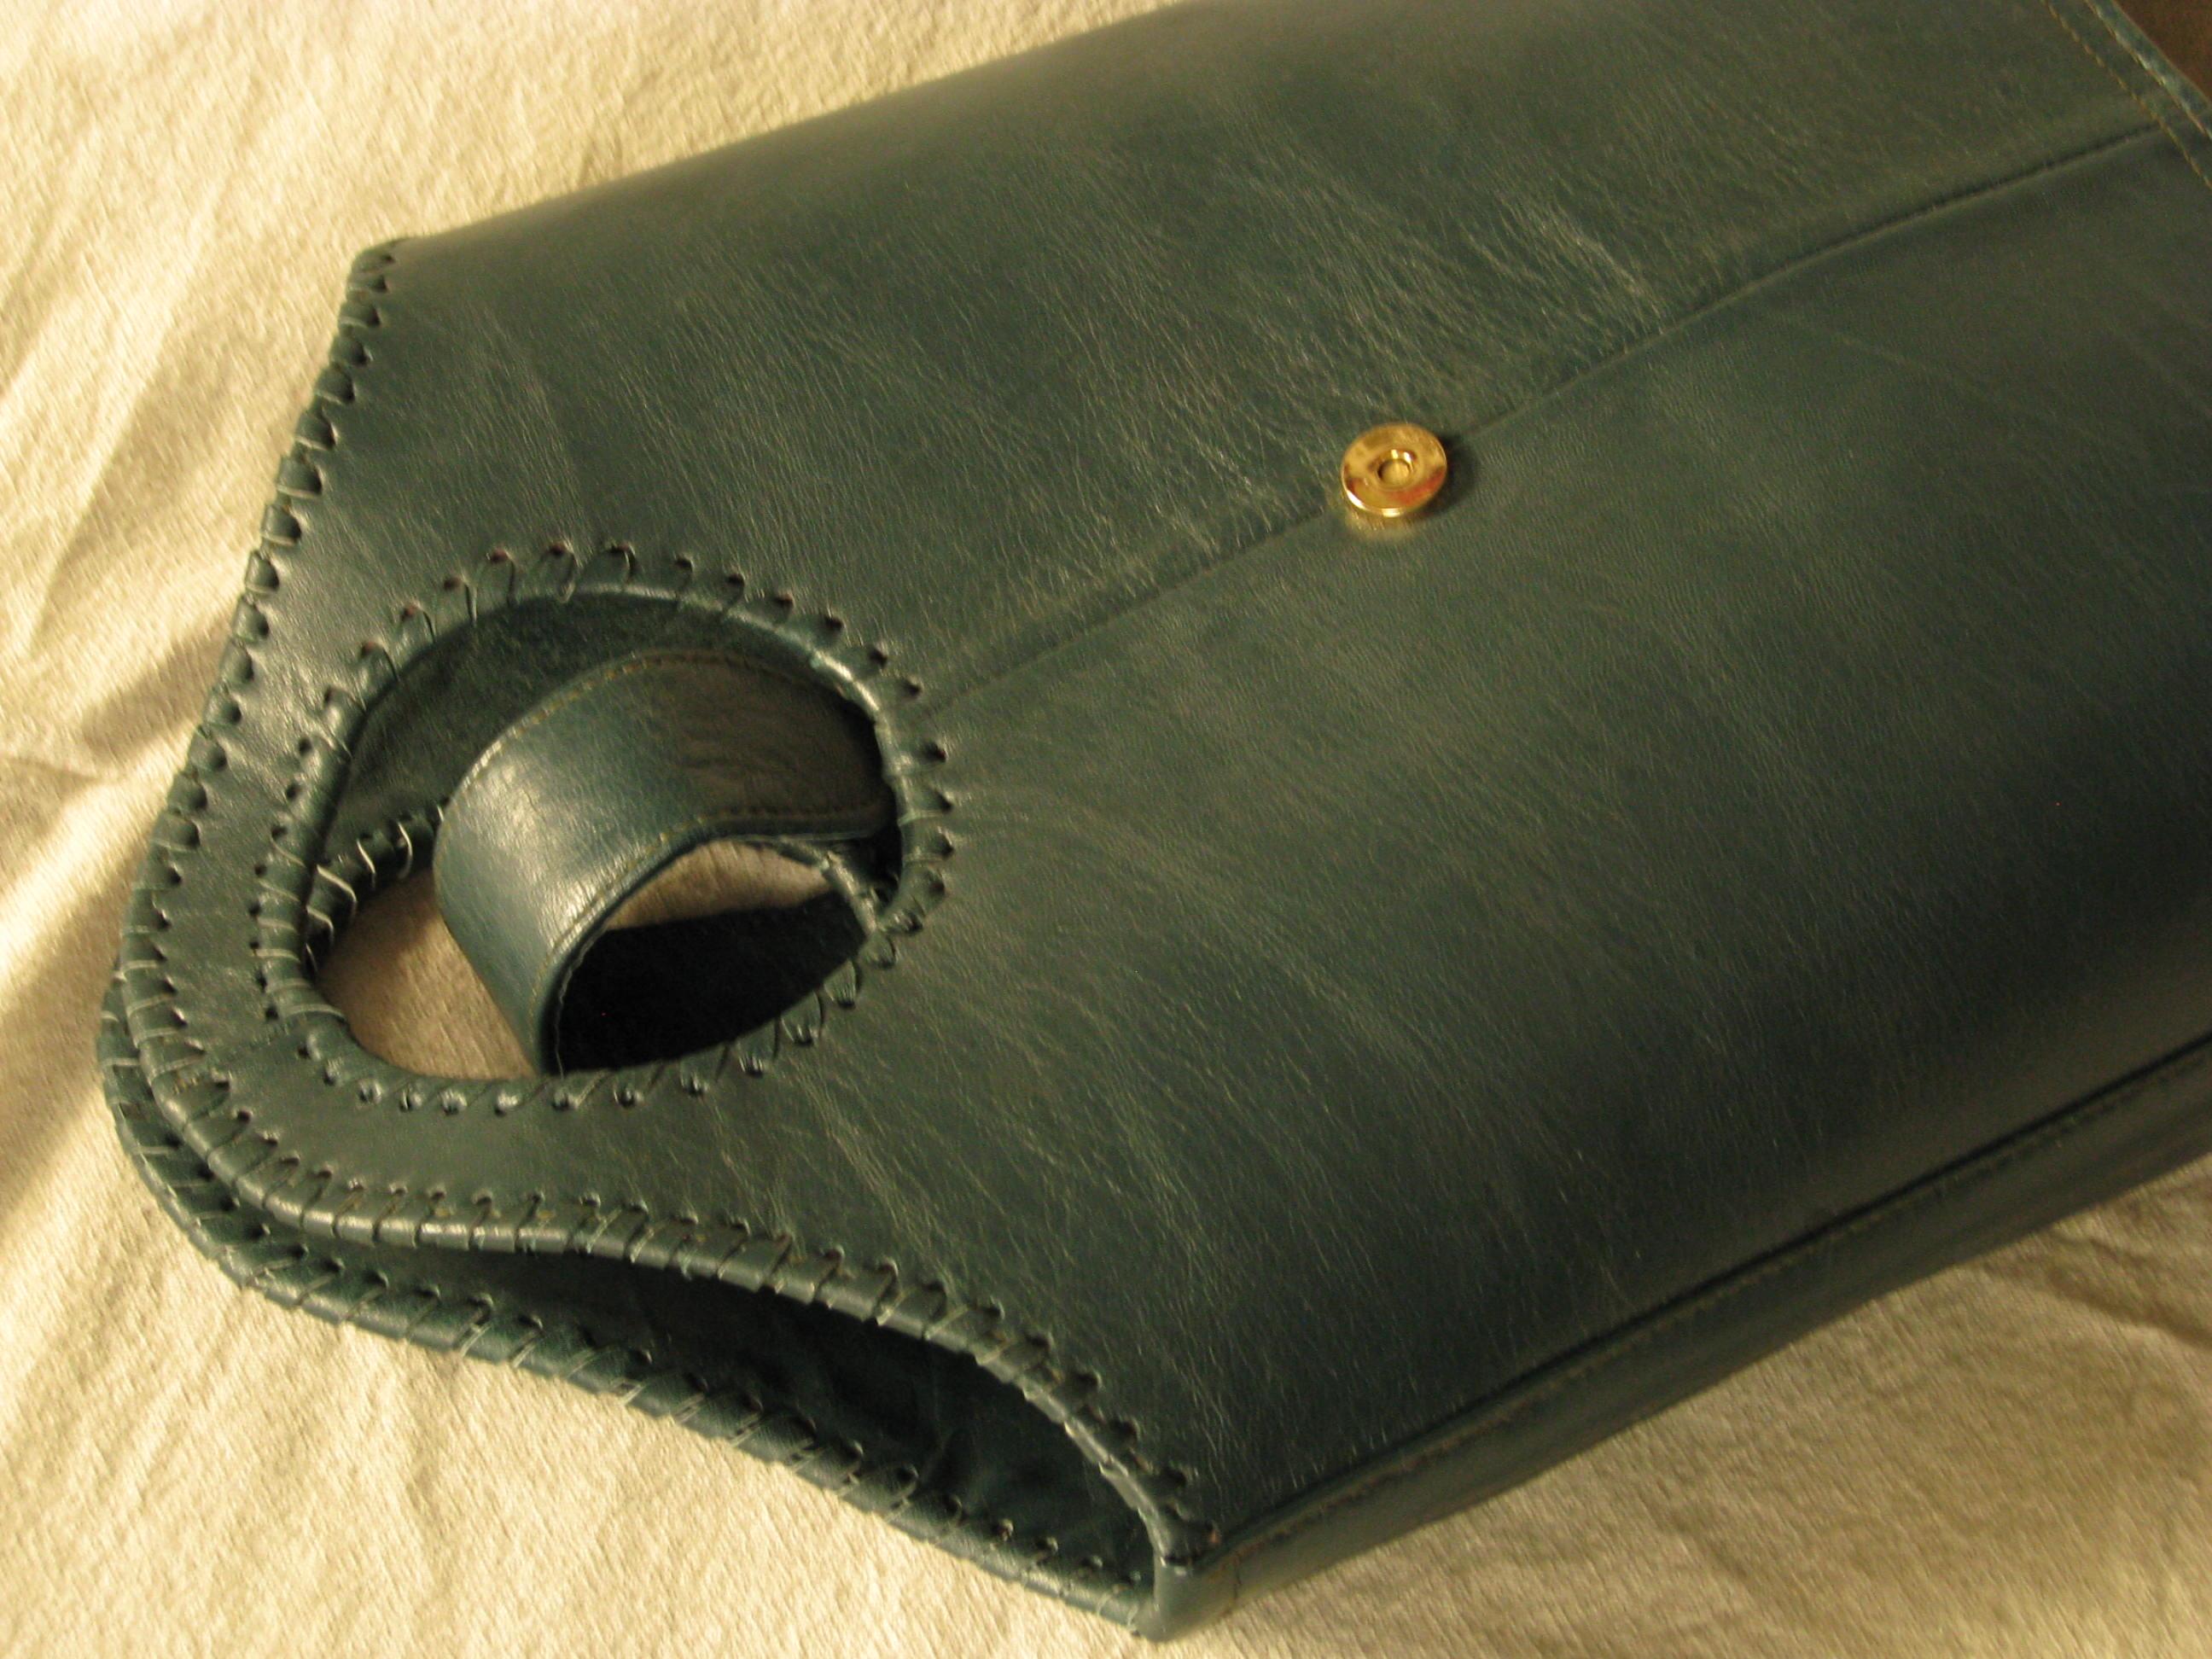 Gundara - dark-green shopper - genuine leather - fair trade - made in Afghanistan